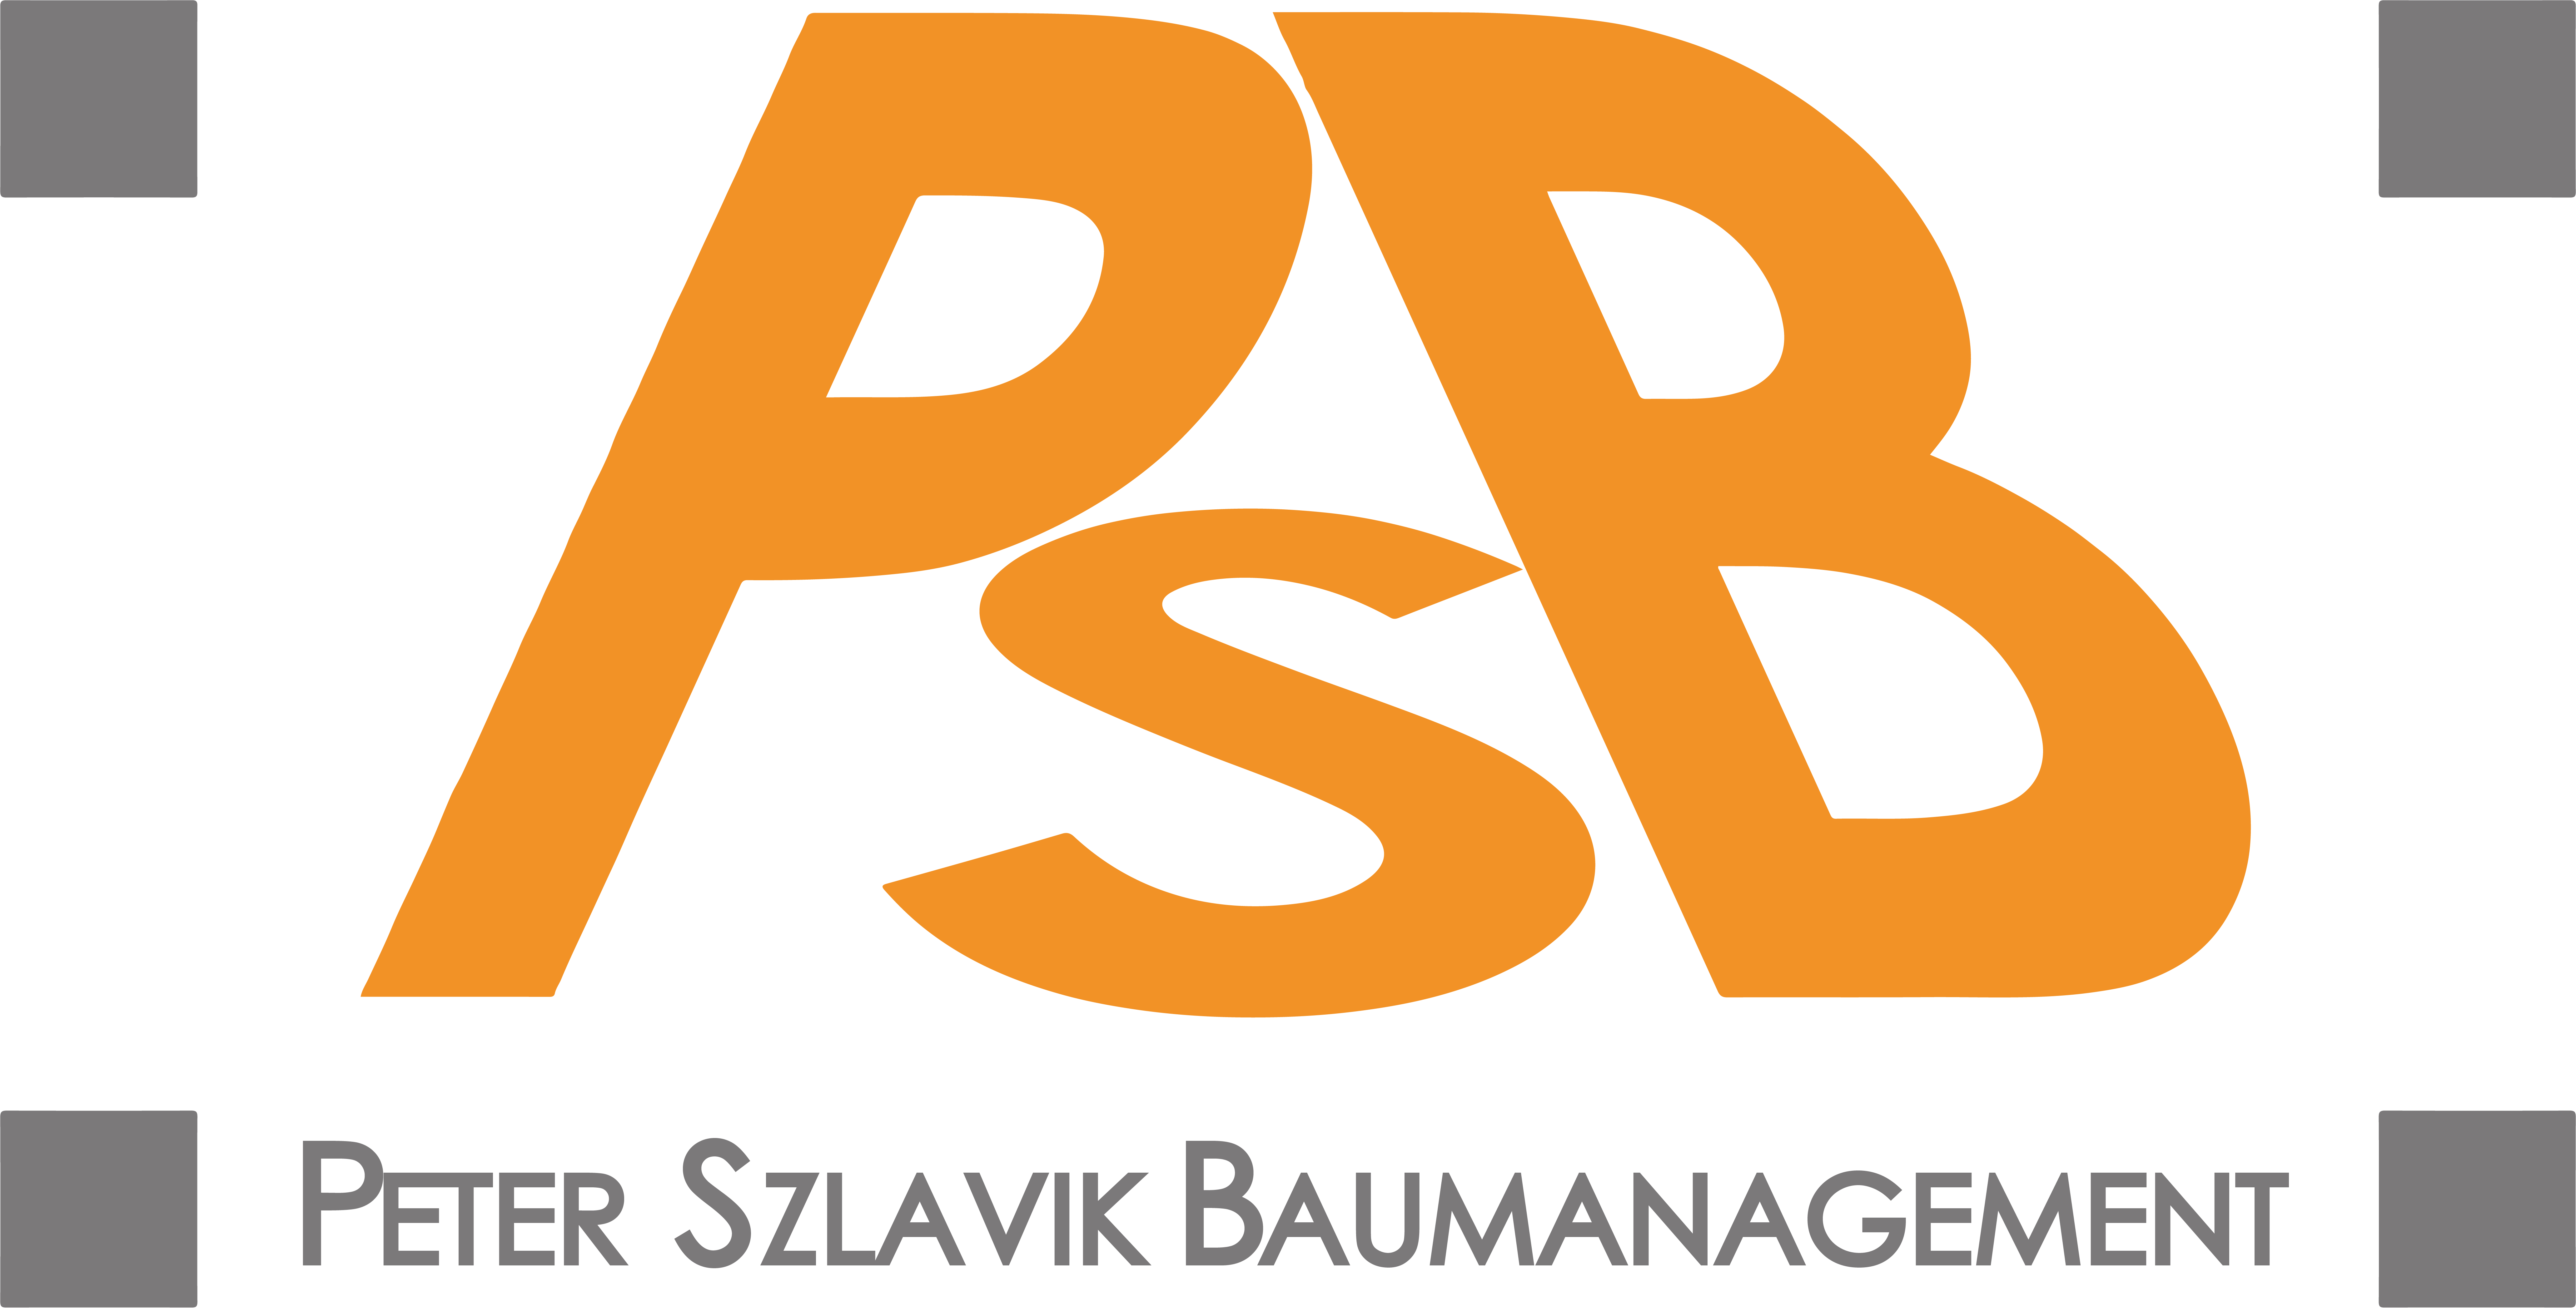 Peter Szlavik Baumanagement